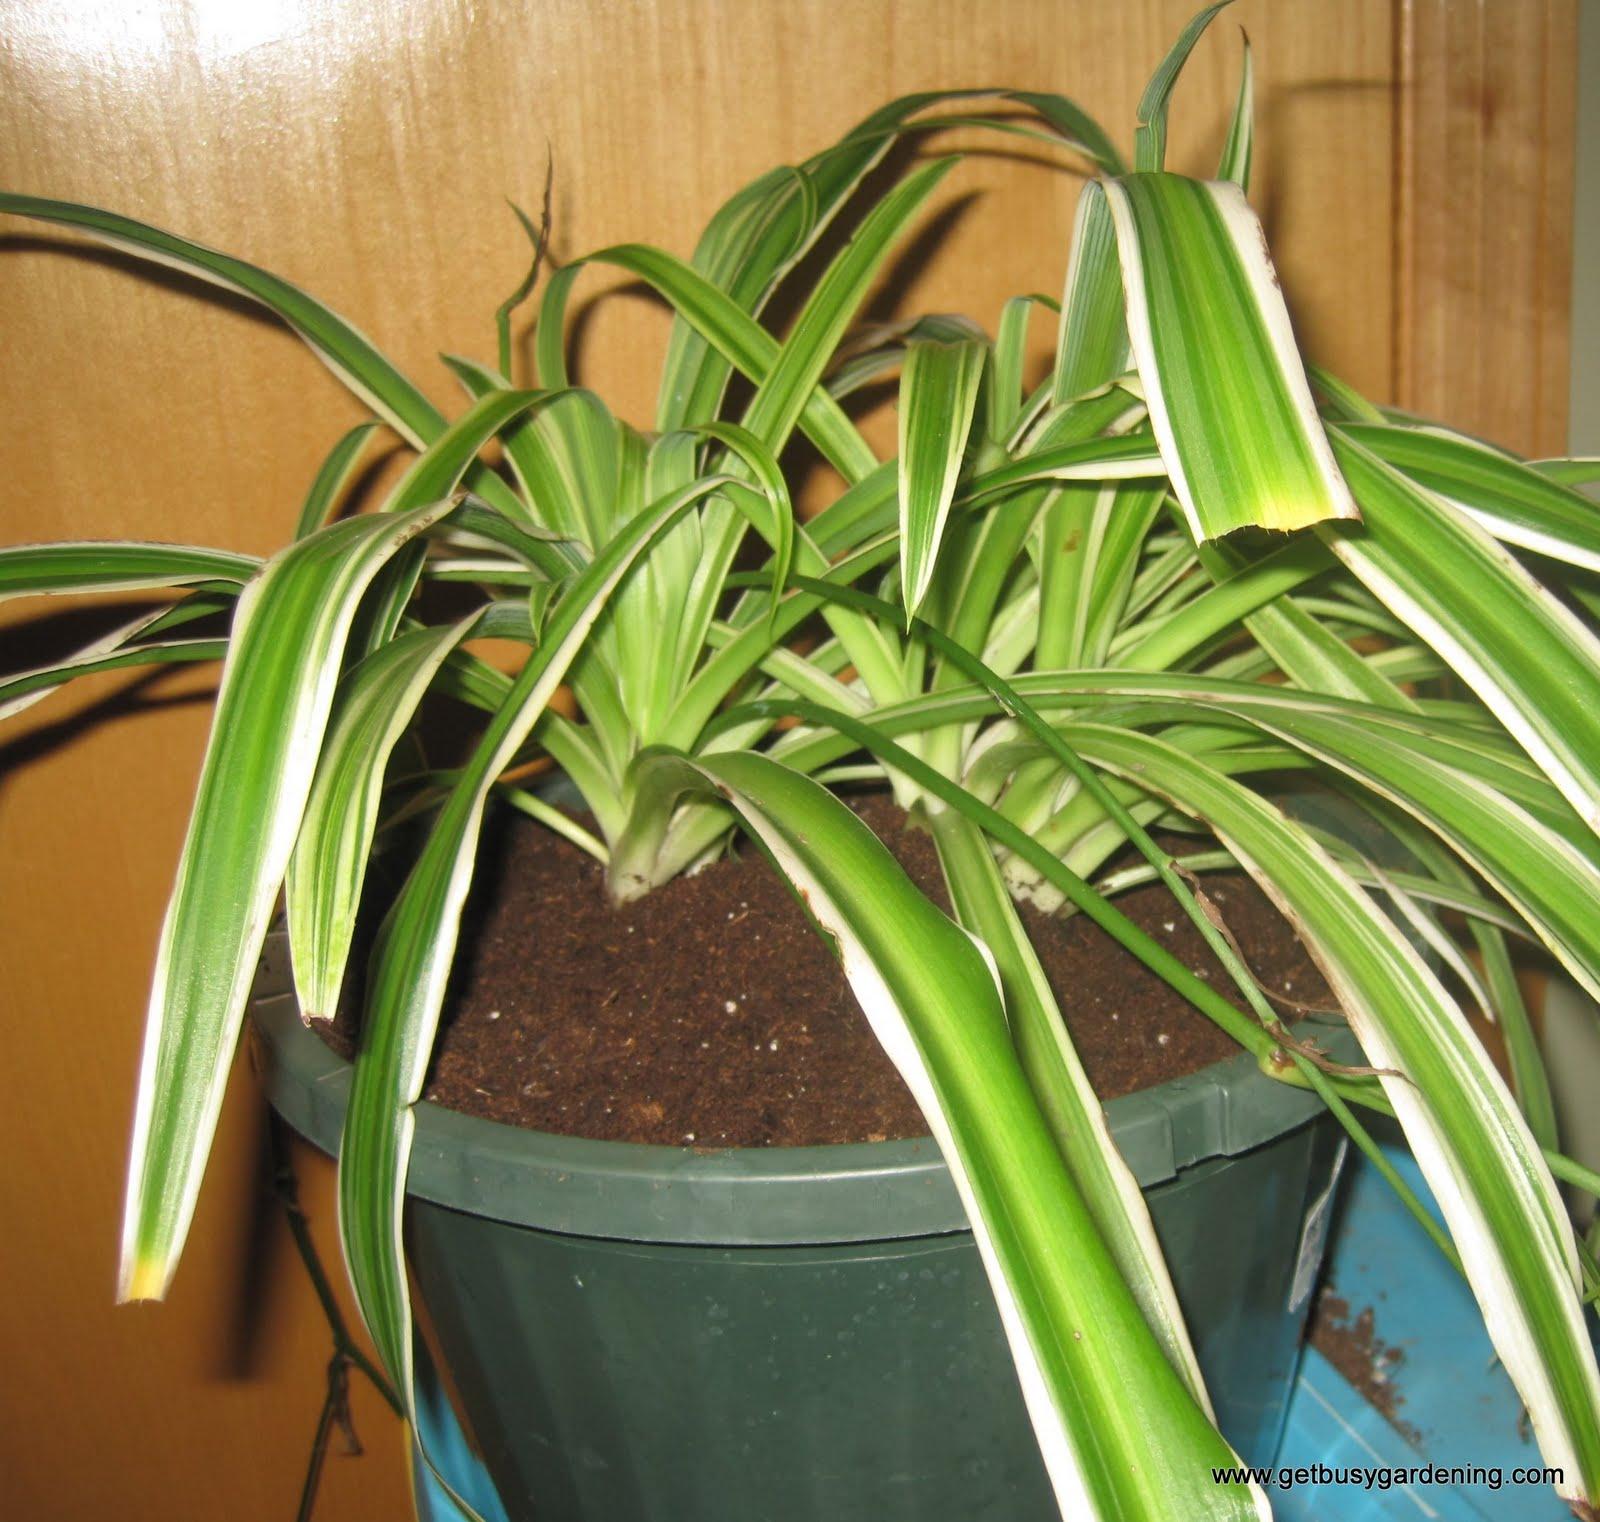 Tips For Repotting Houseplants